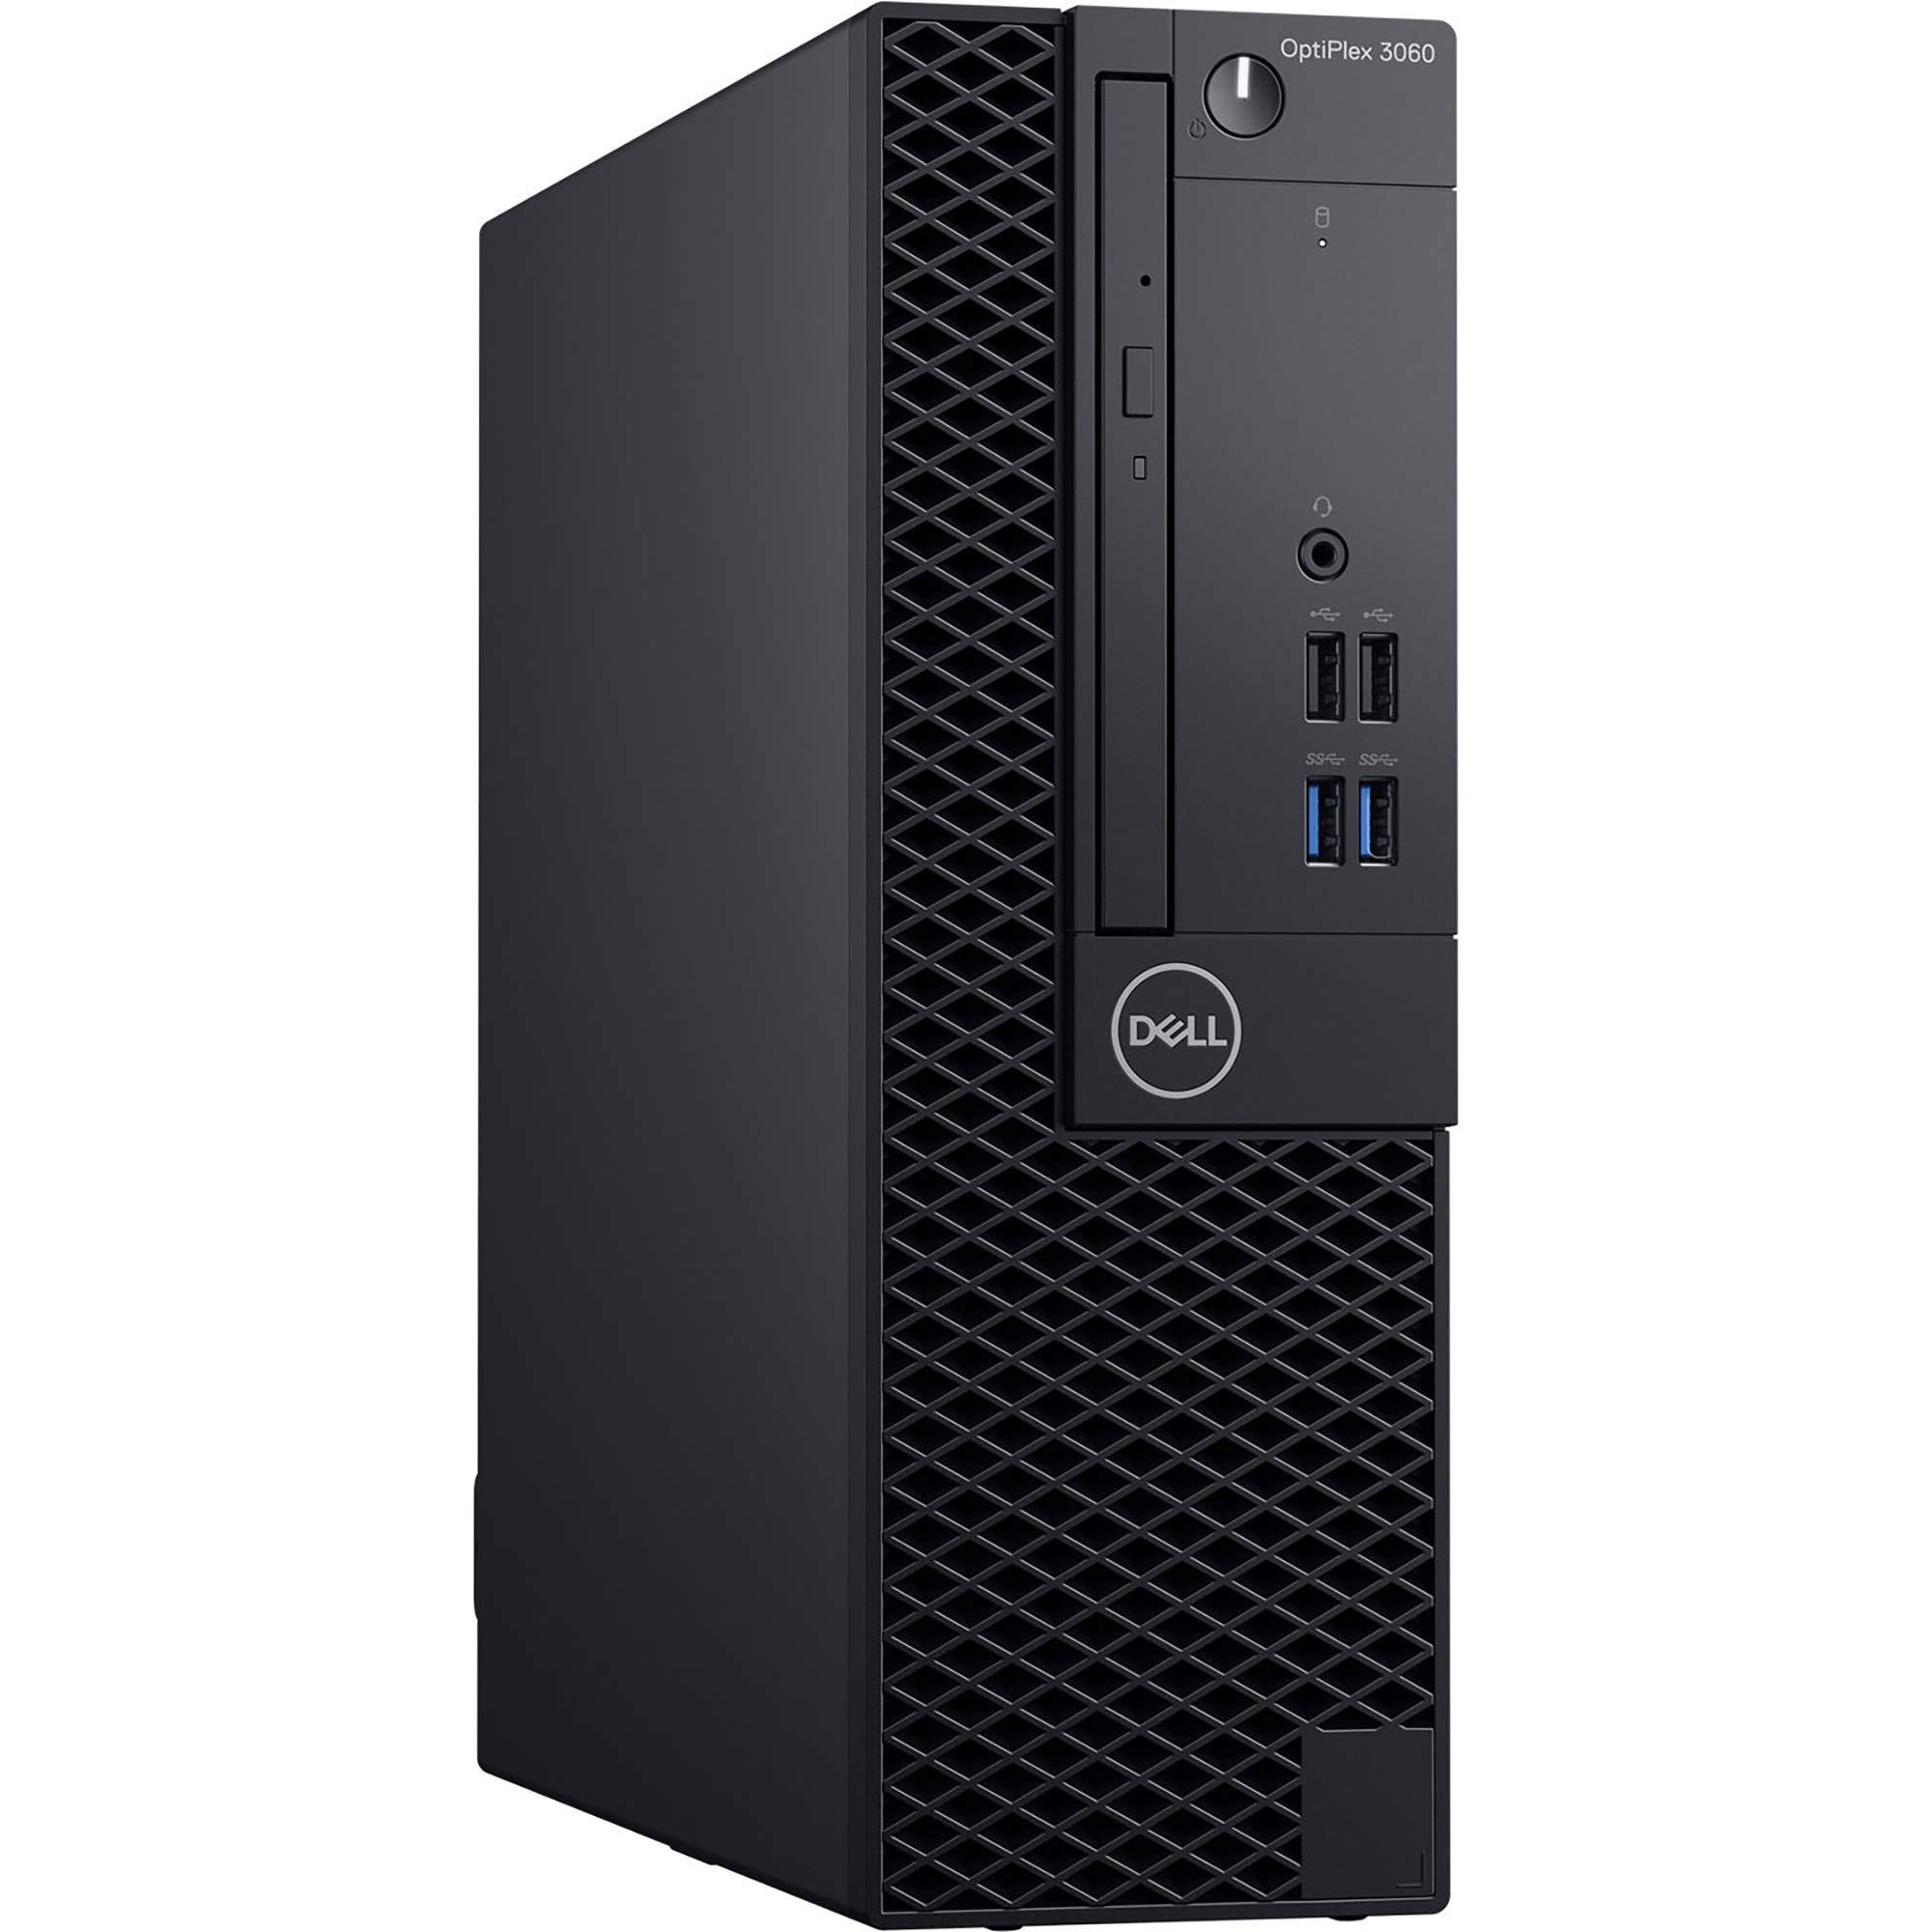 Dell OptiPlex 3060 SFF Desktop Computer with Intel Core i5-8500 3 GHz Hexa-core, 8GB RAM, 256GB SSD (KM82W)